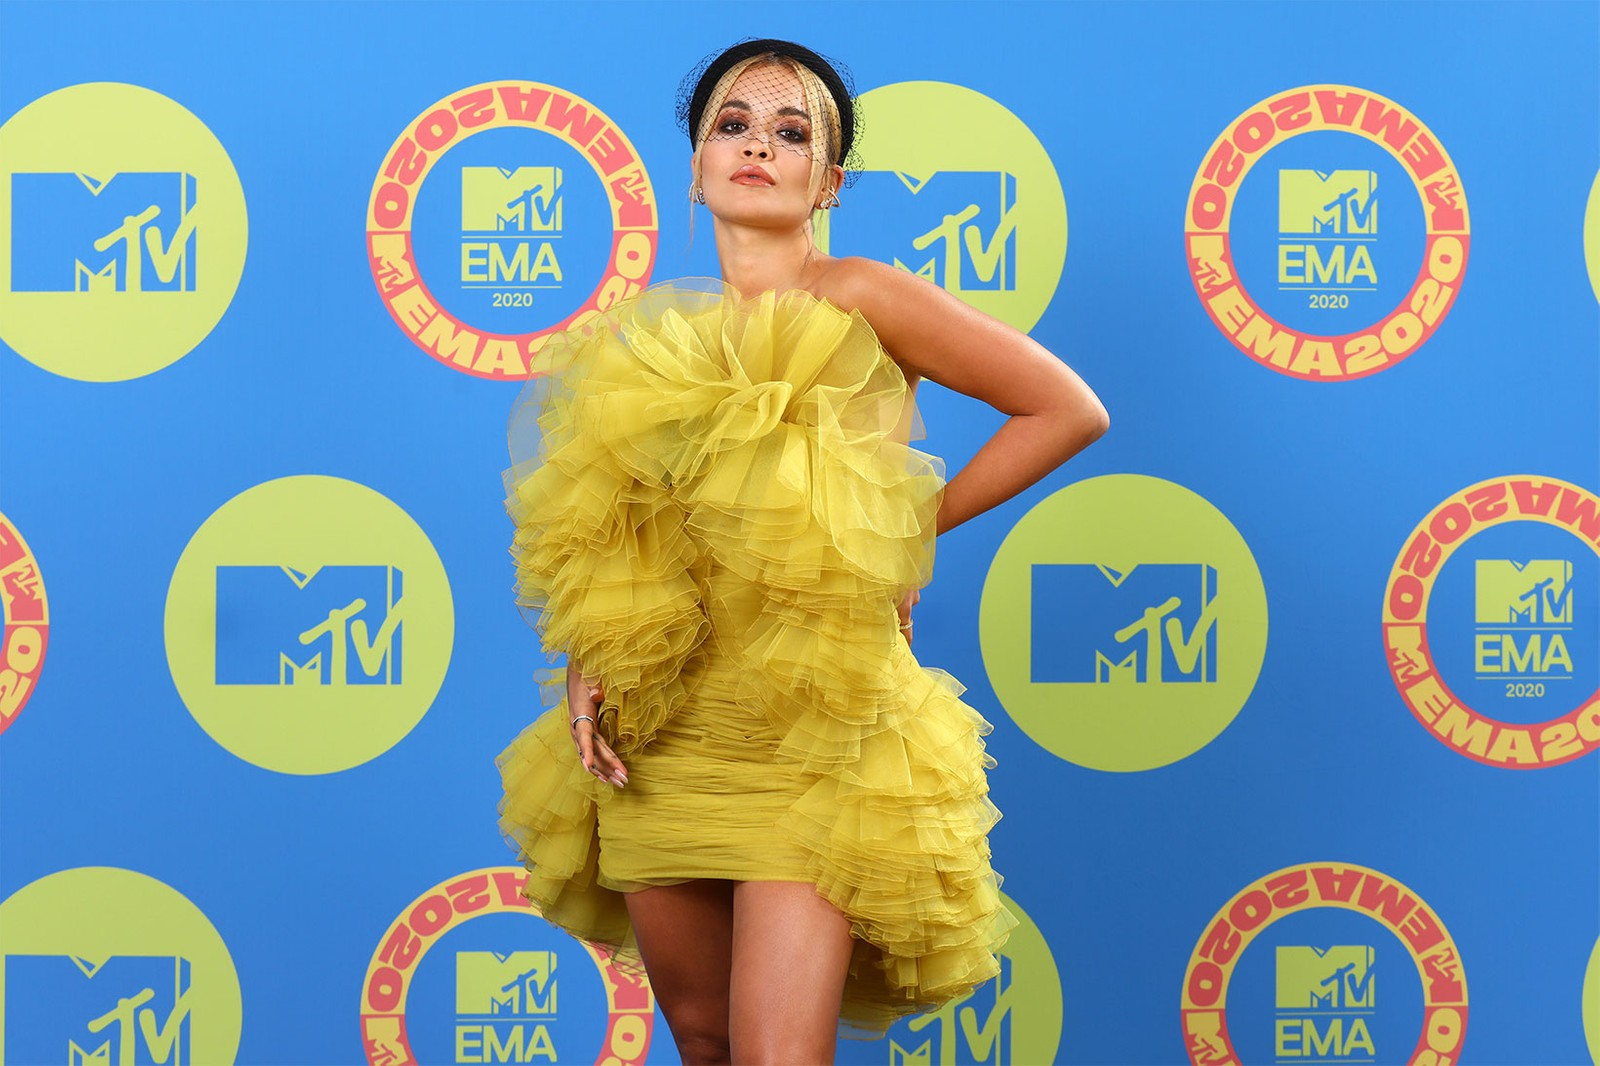 mtv emas europe music award best red carpet looks outfits celebrity style madison beer rita ora alicia keys